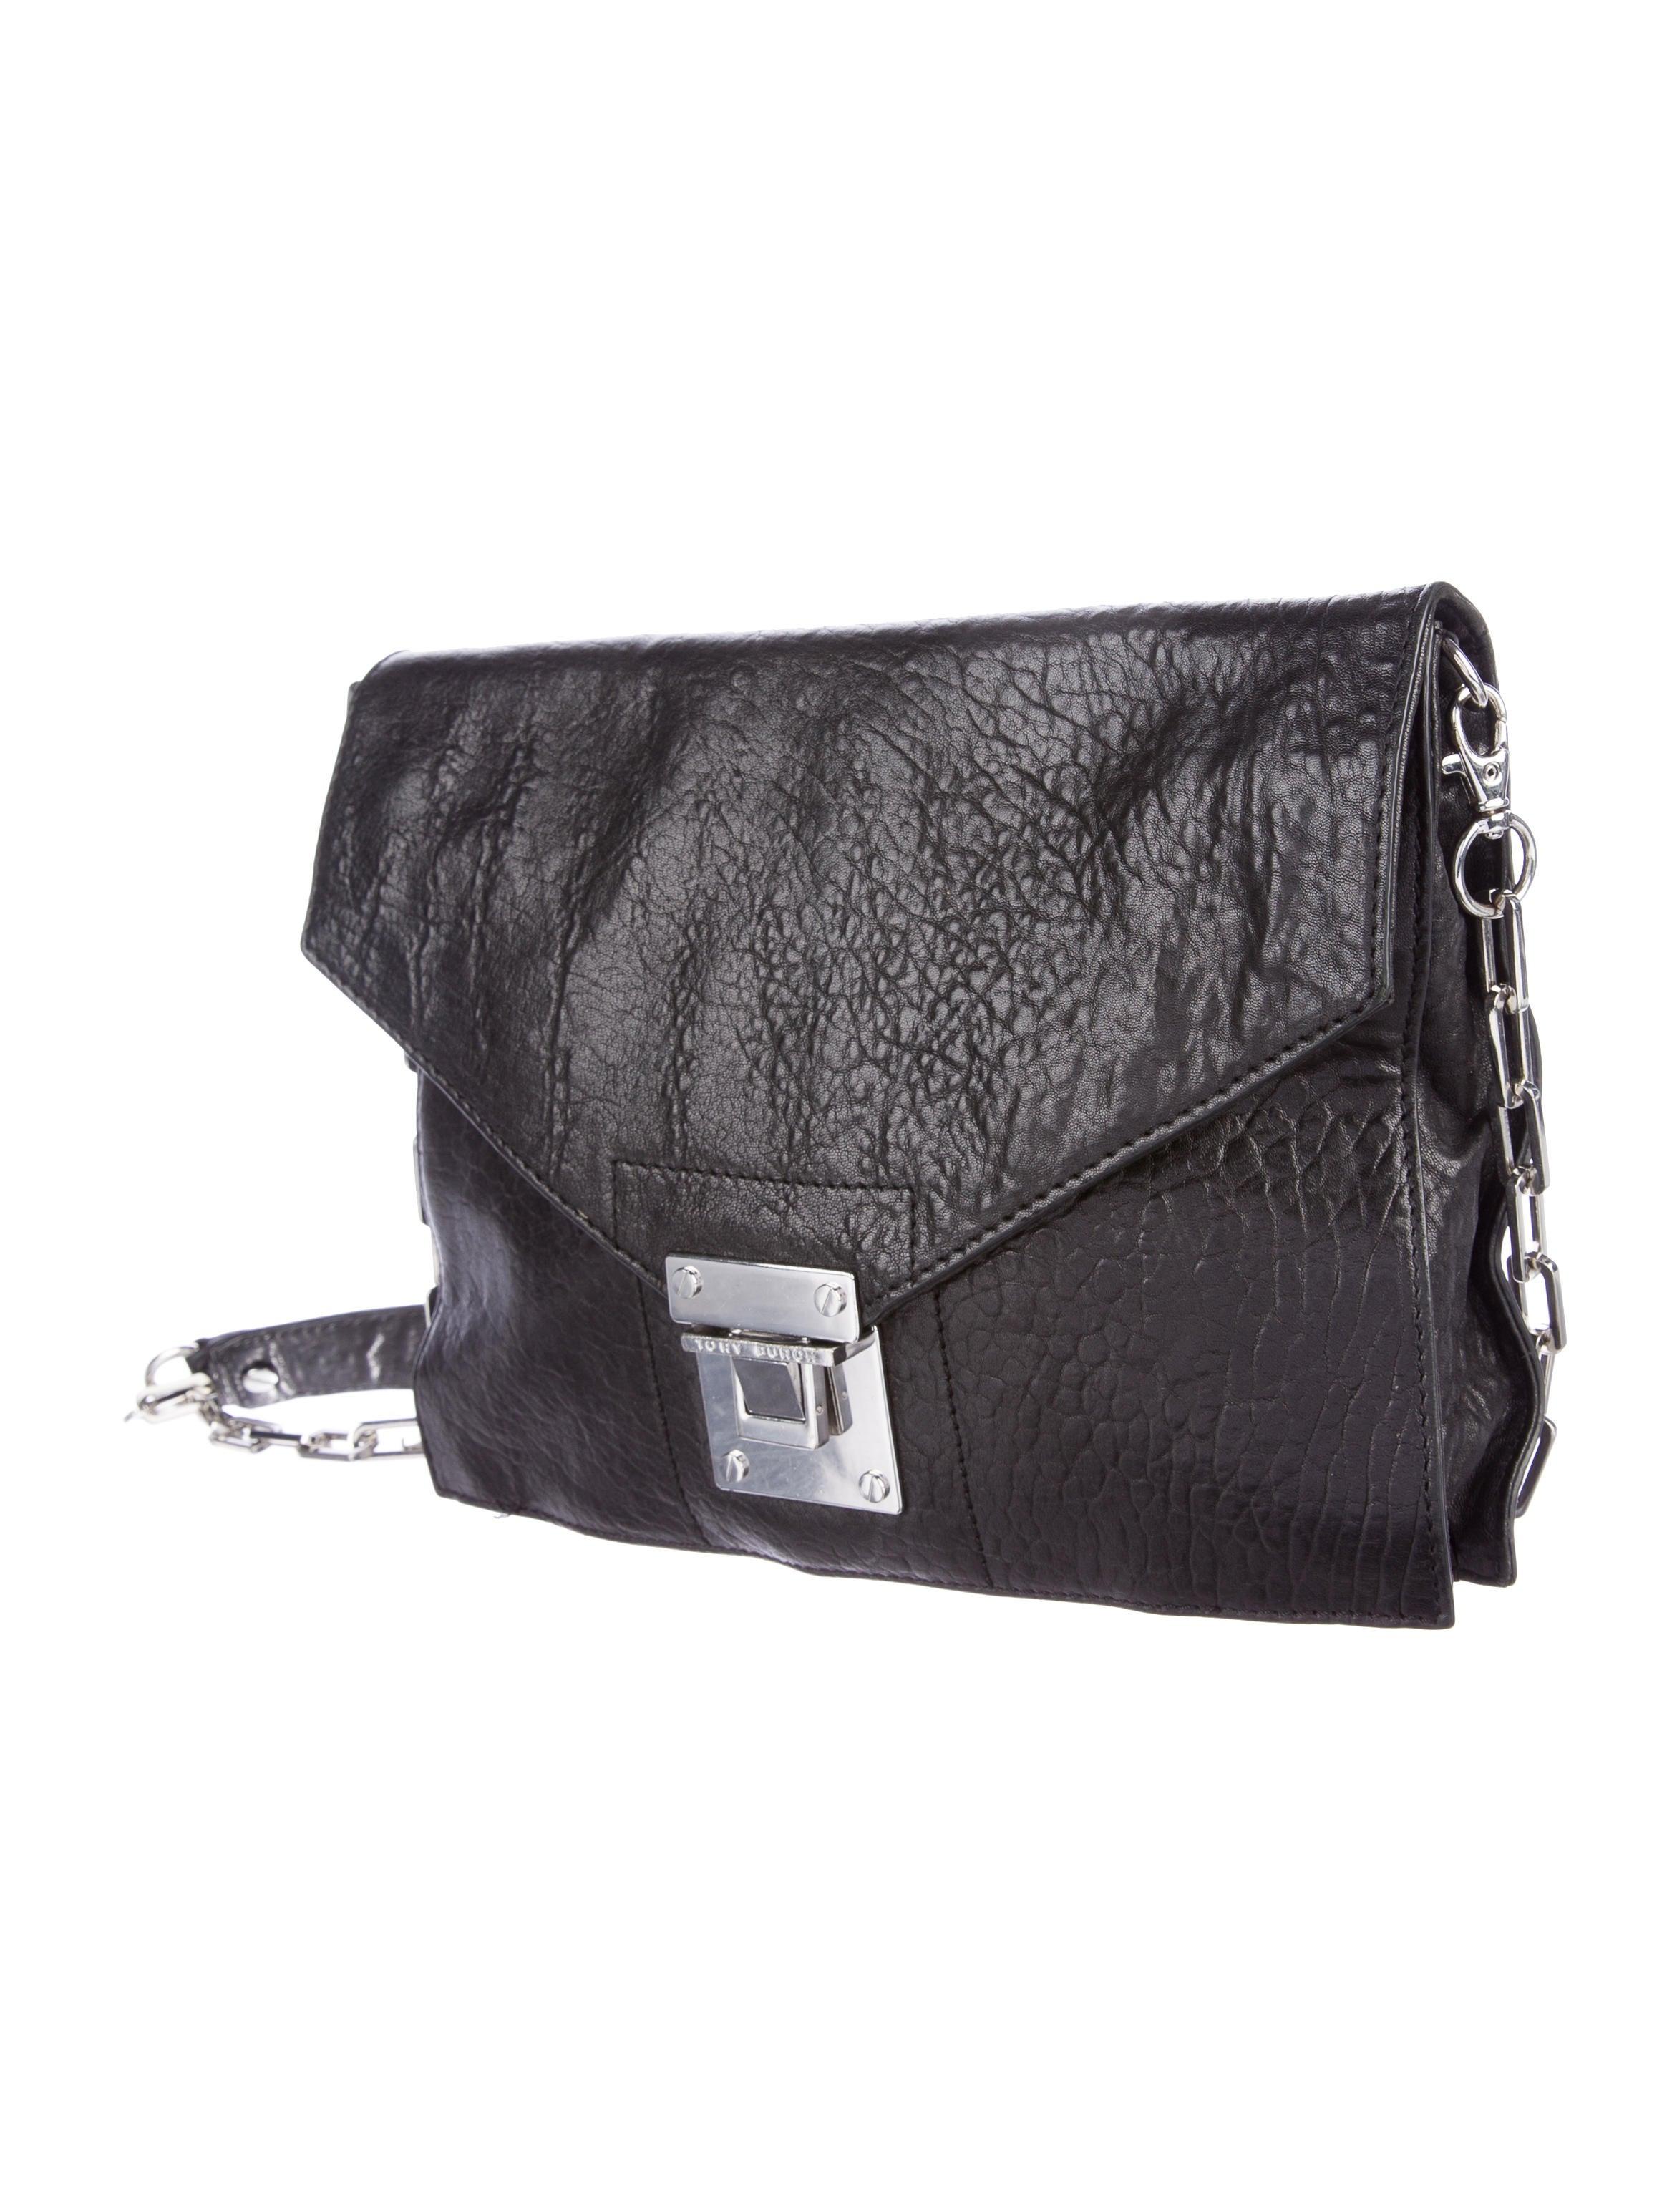 Black Pebbled Leather Crossbody Bag 112